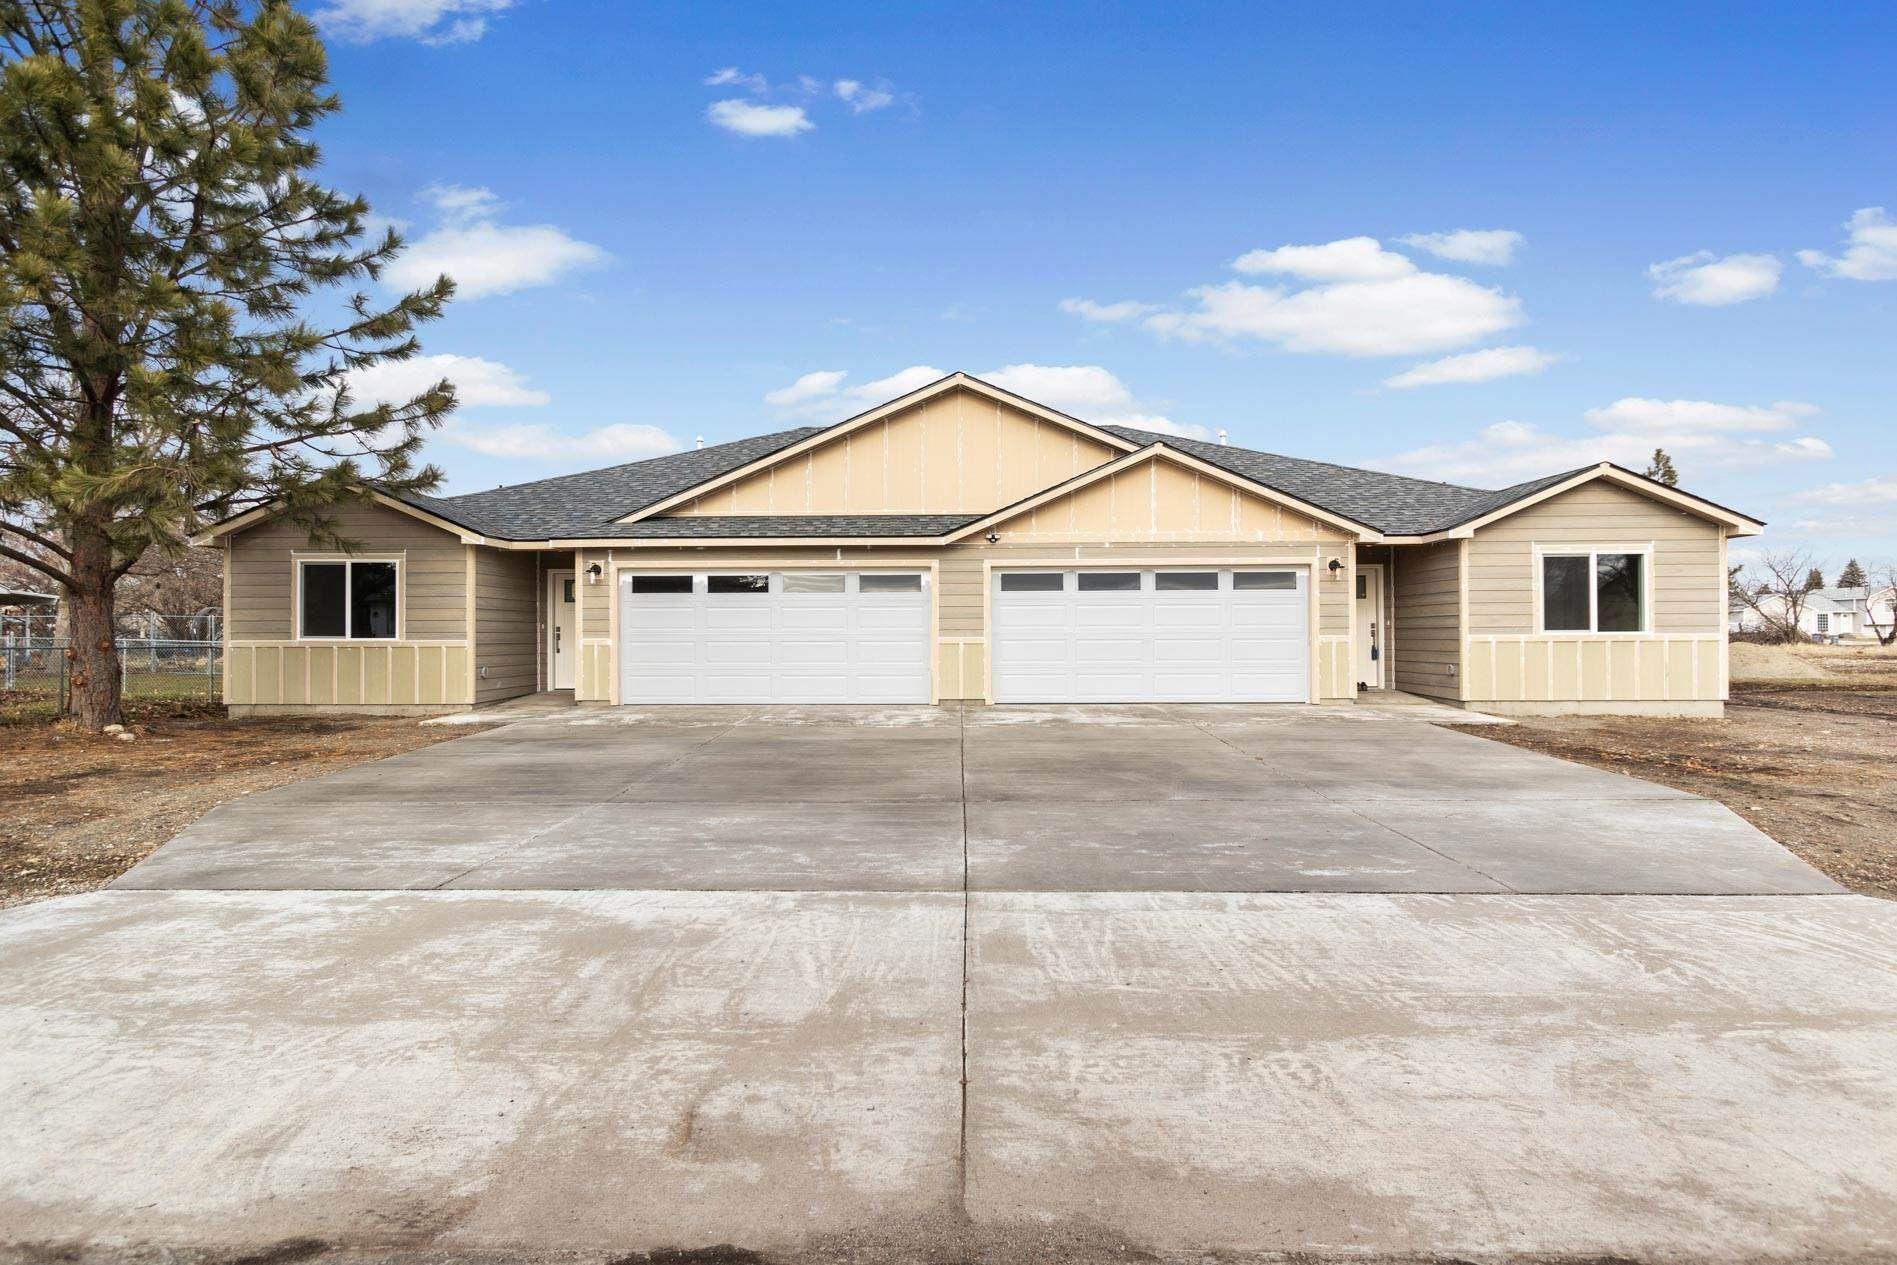 8021 E Nora Ave, Spokane Valley, WA 99212 - #: 202111342